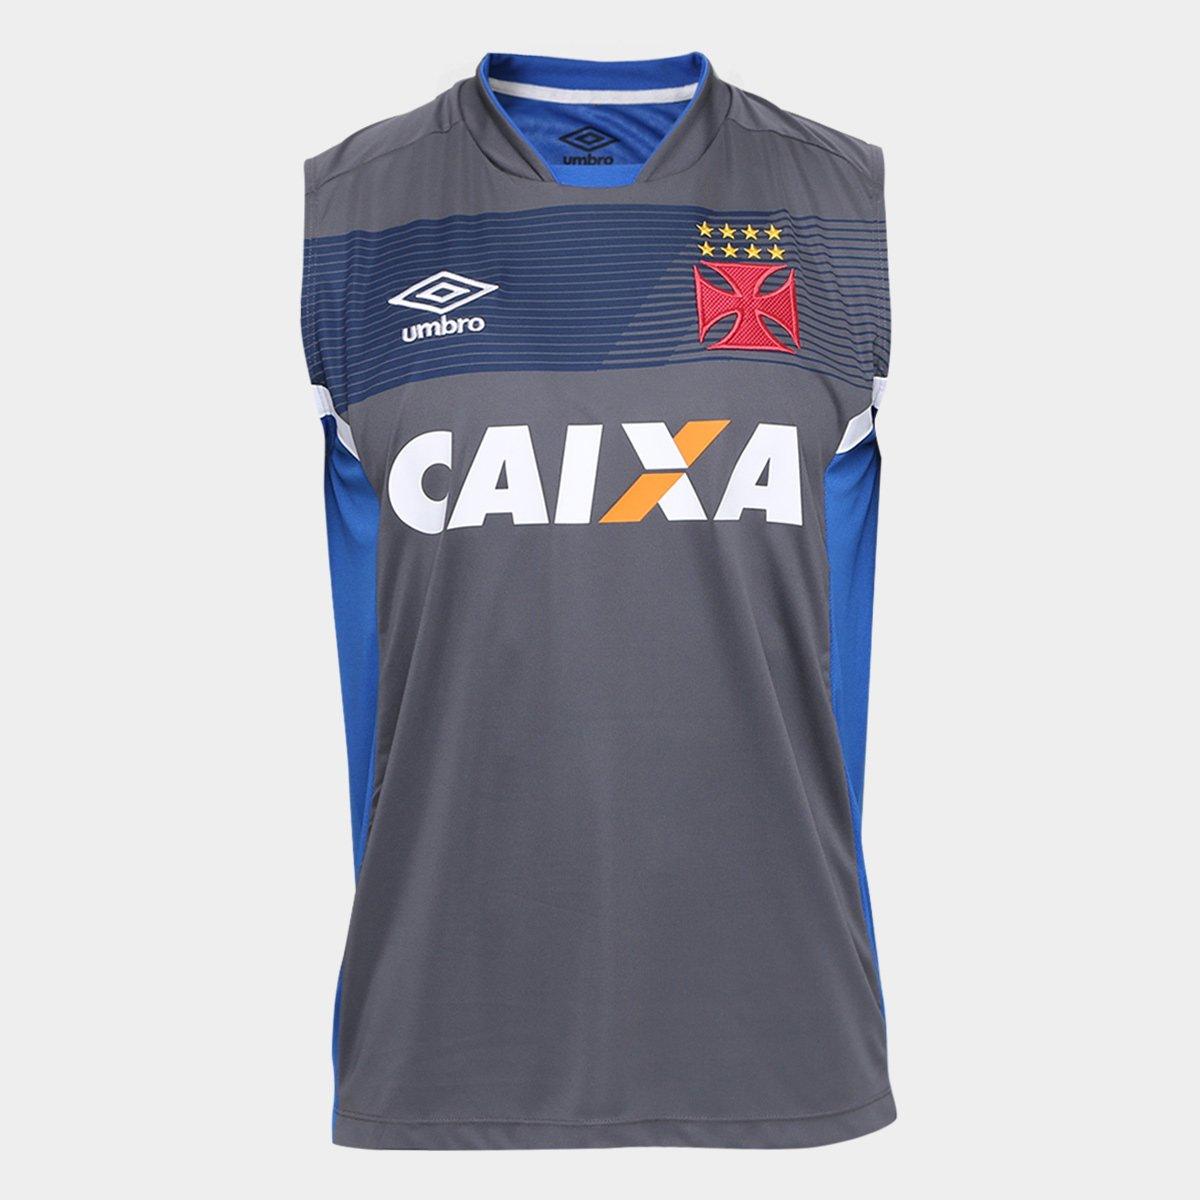 80dde80338 Camisa de Treino Vasco 17/18 Umbro Masculina | Shop Vasco